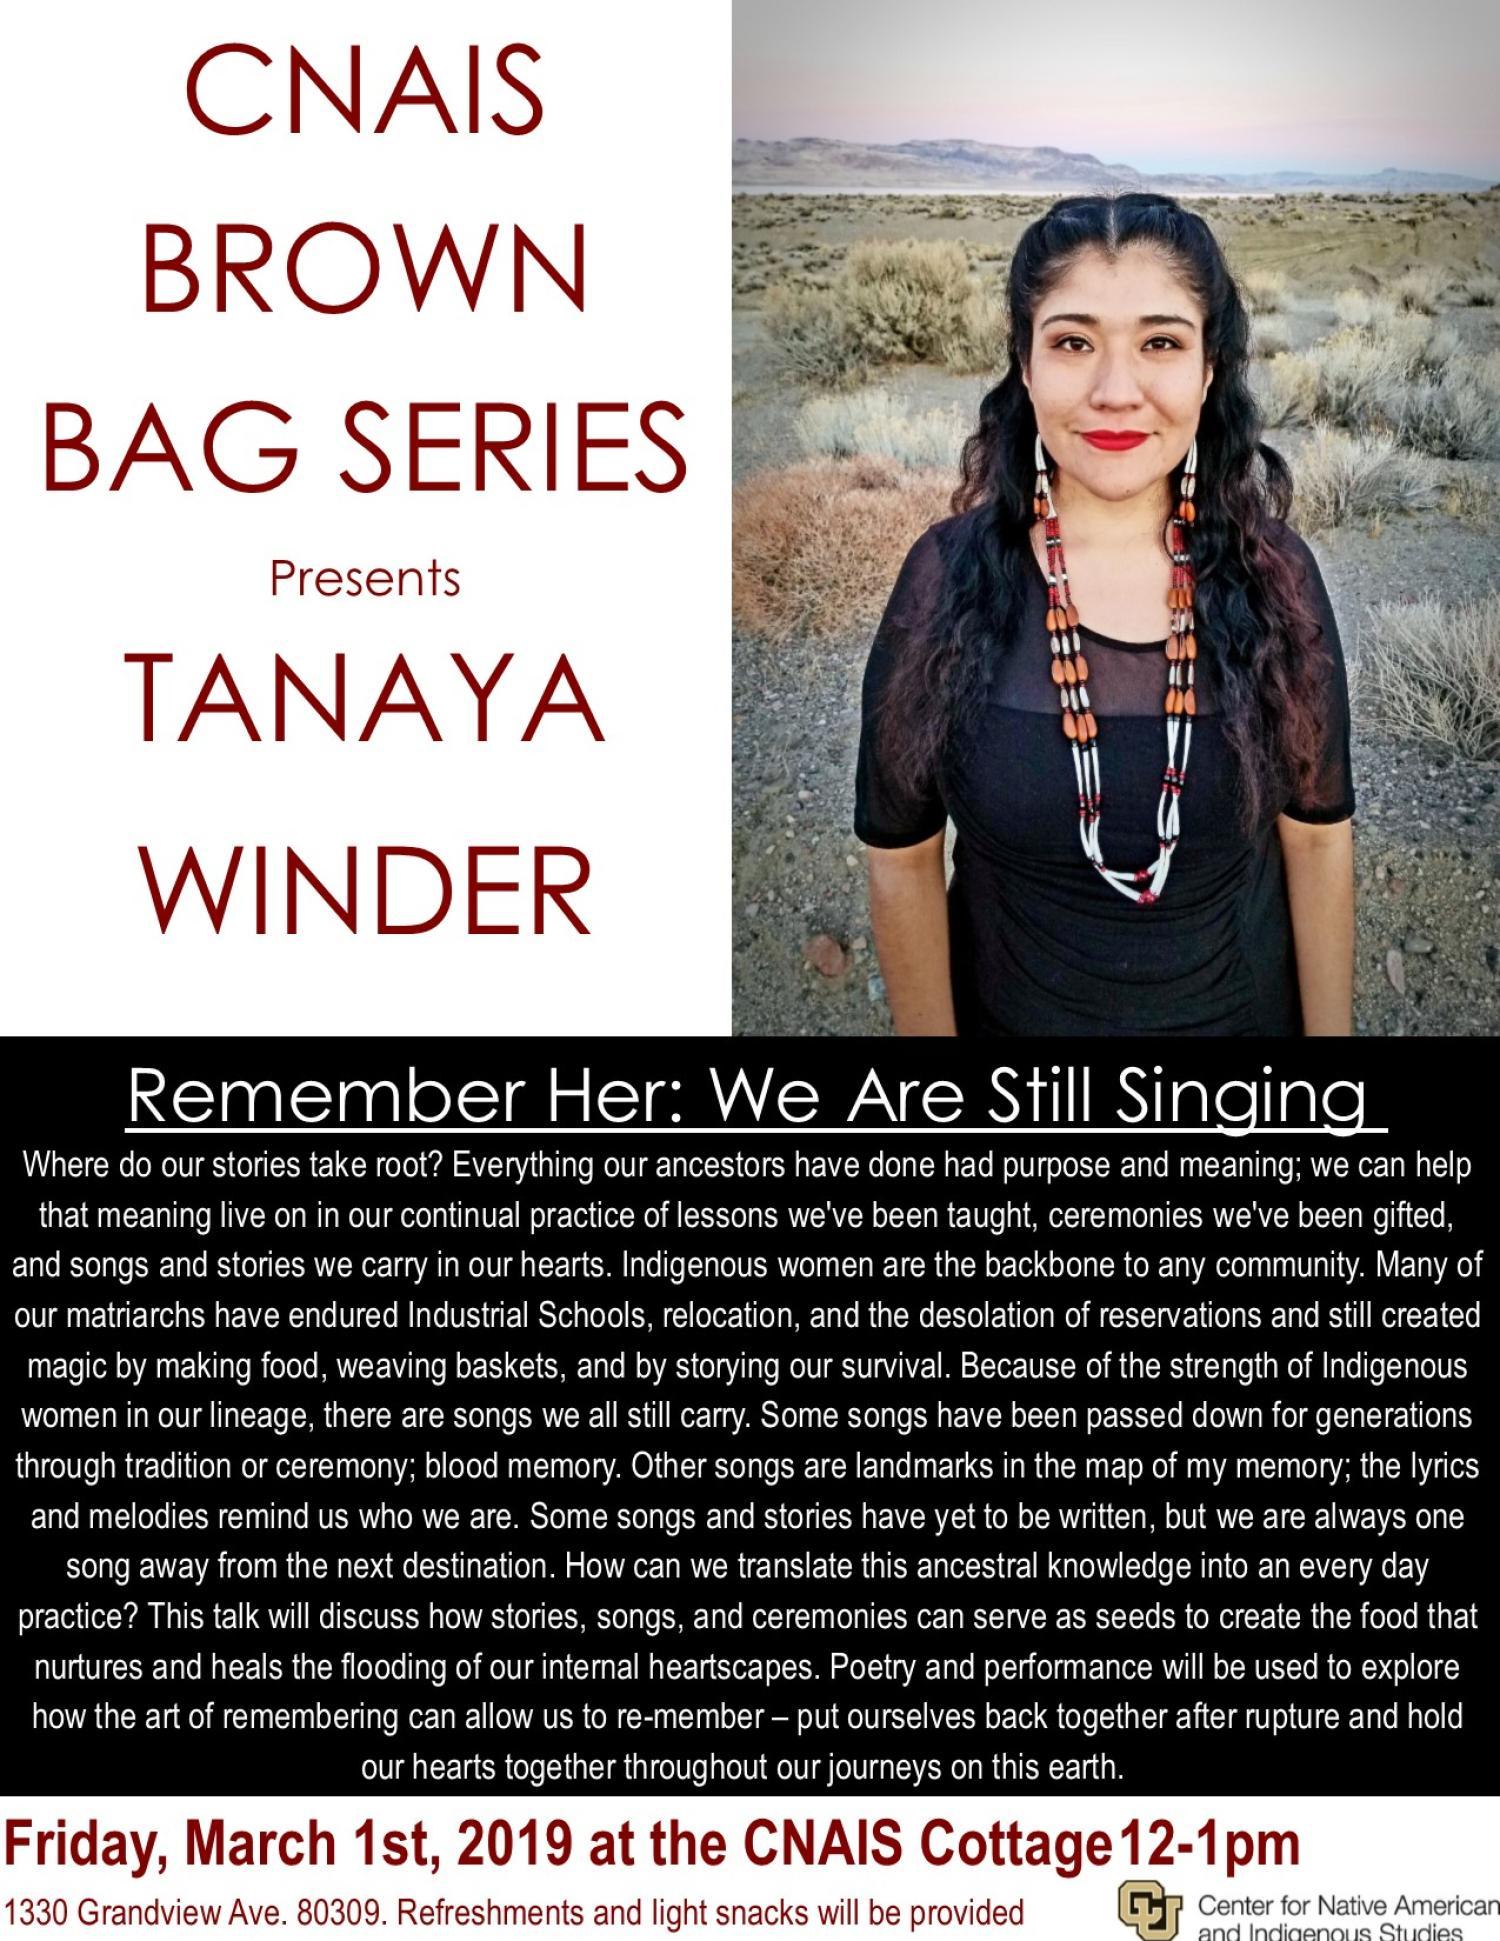 Tanaya Winder